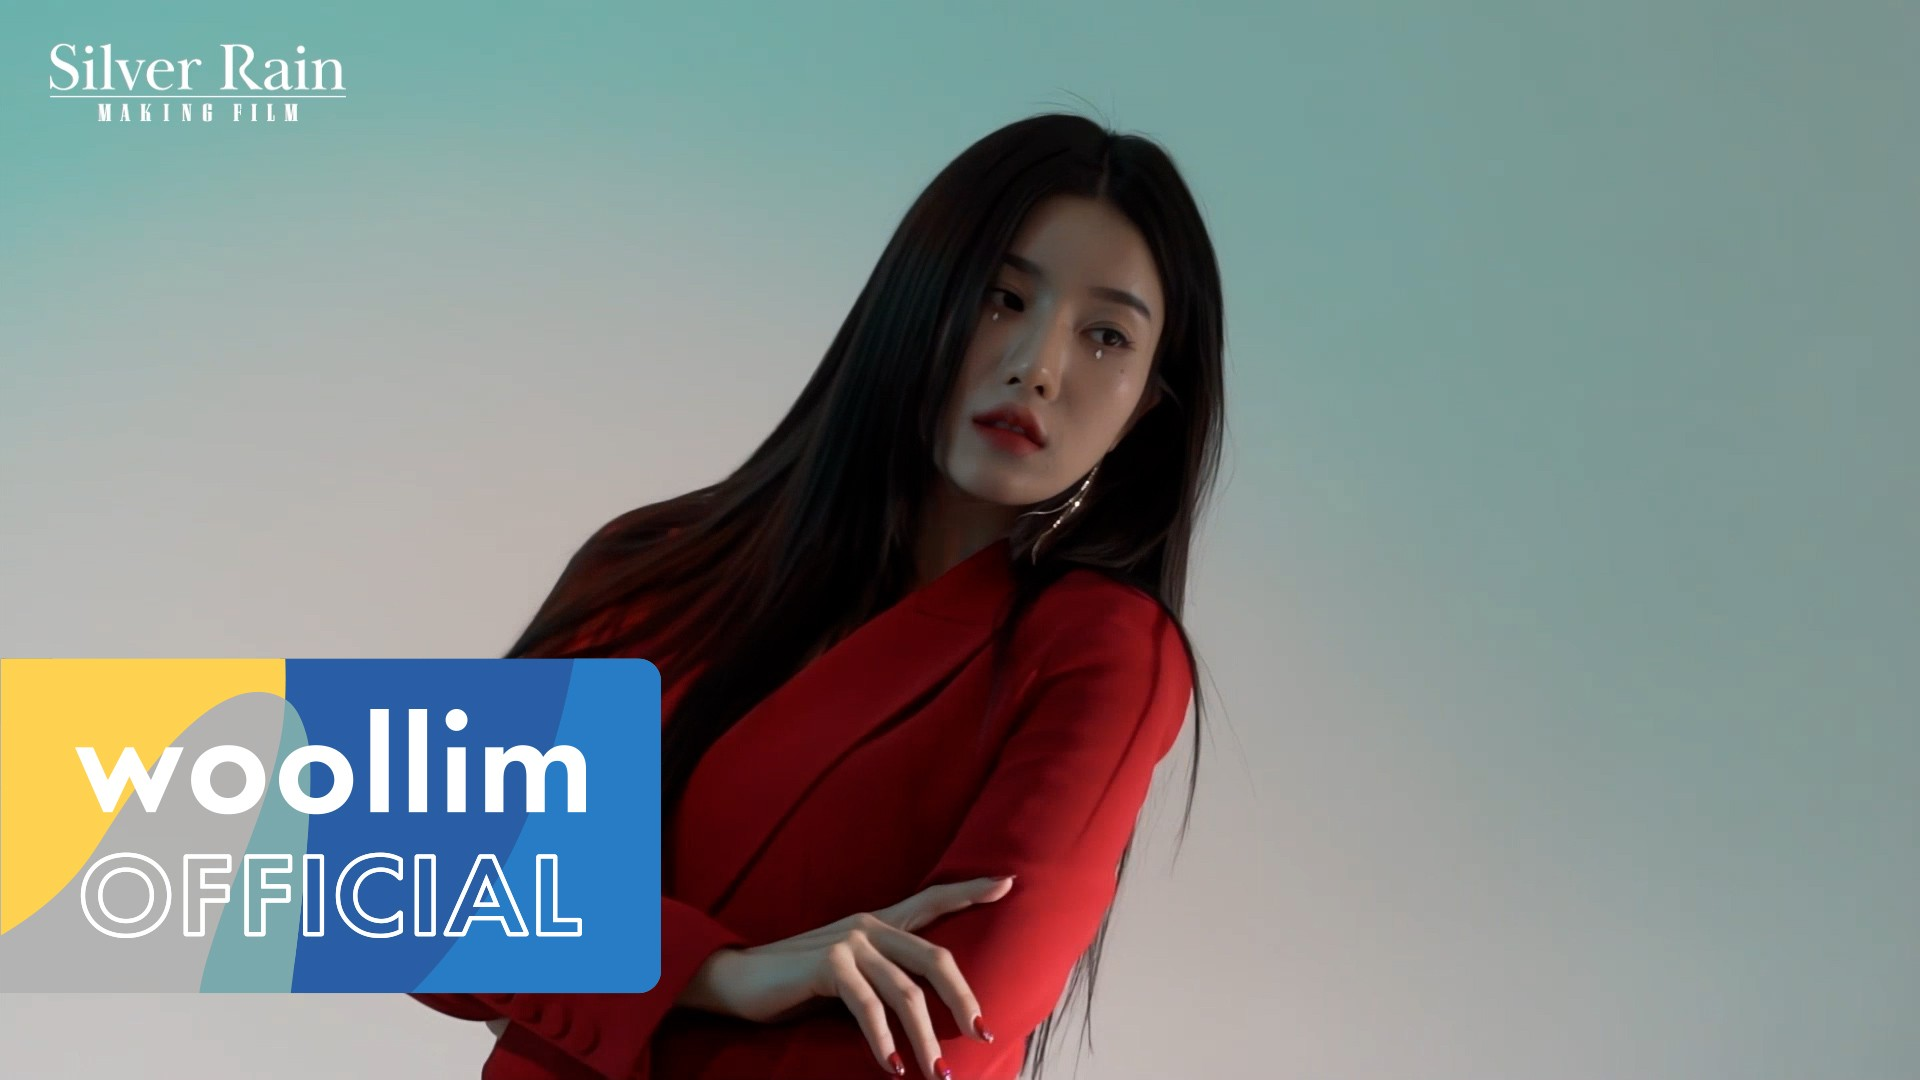 [Silver Rain Making Film] FIRST PHOTO BOOK 권은비(KWON EUN BI)